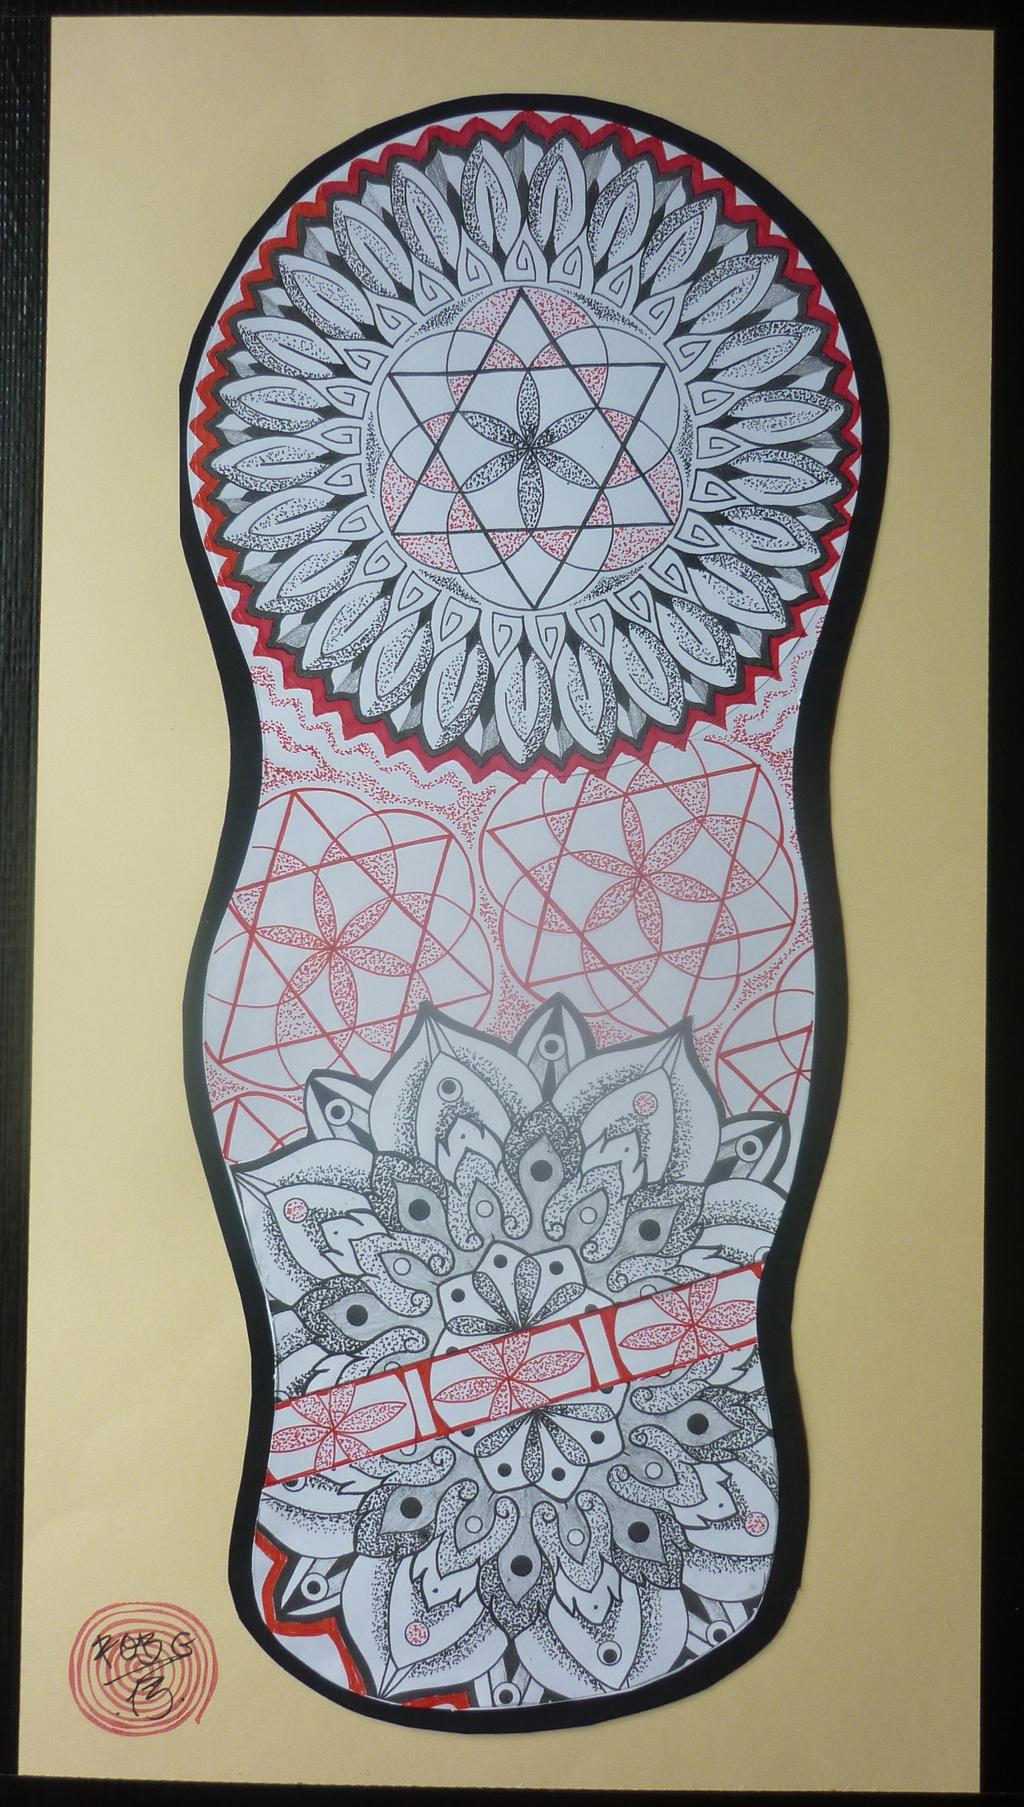 mandala sleeve 3 by robgtattoo on deviantart. Black Bedroom Furniture Sets. Home Design Ideas